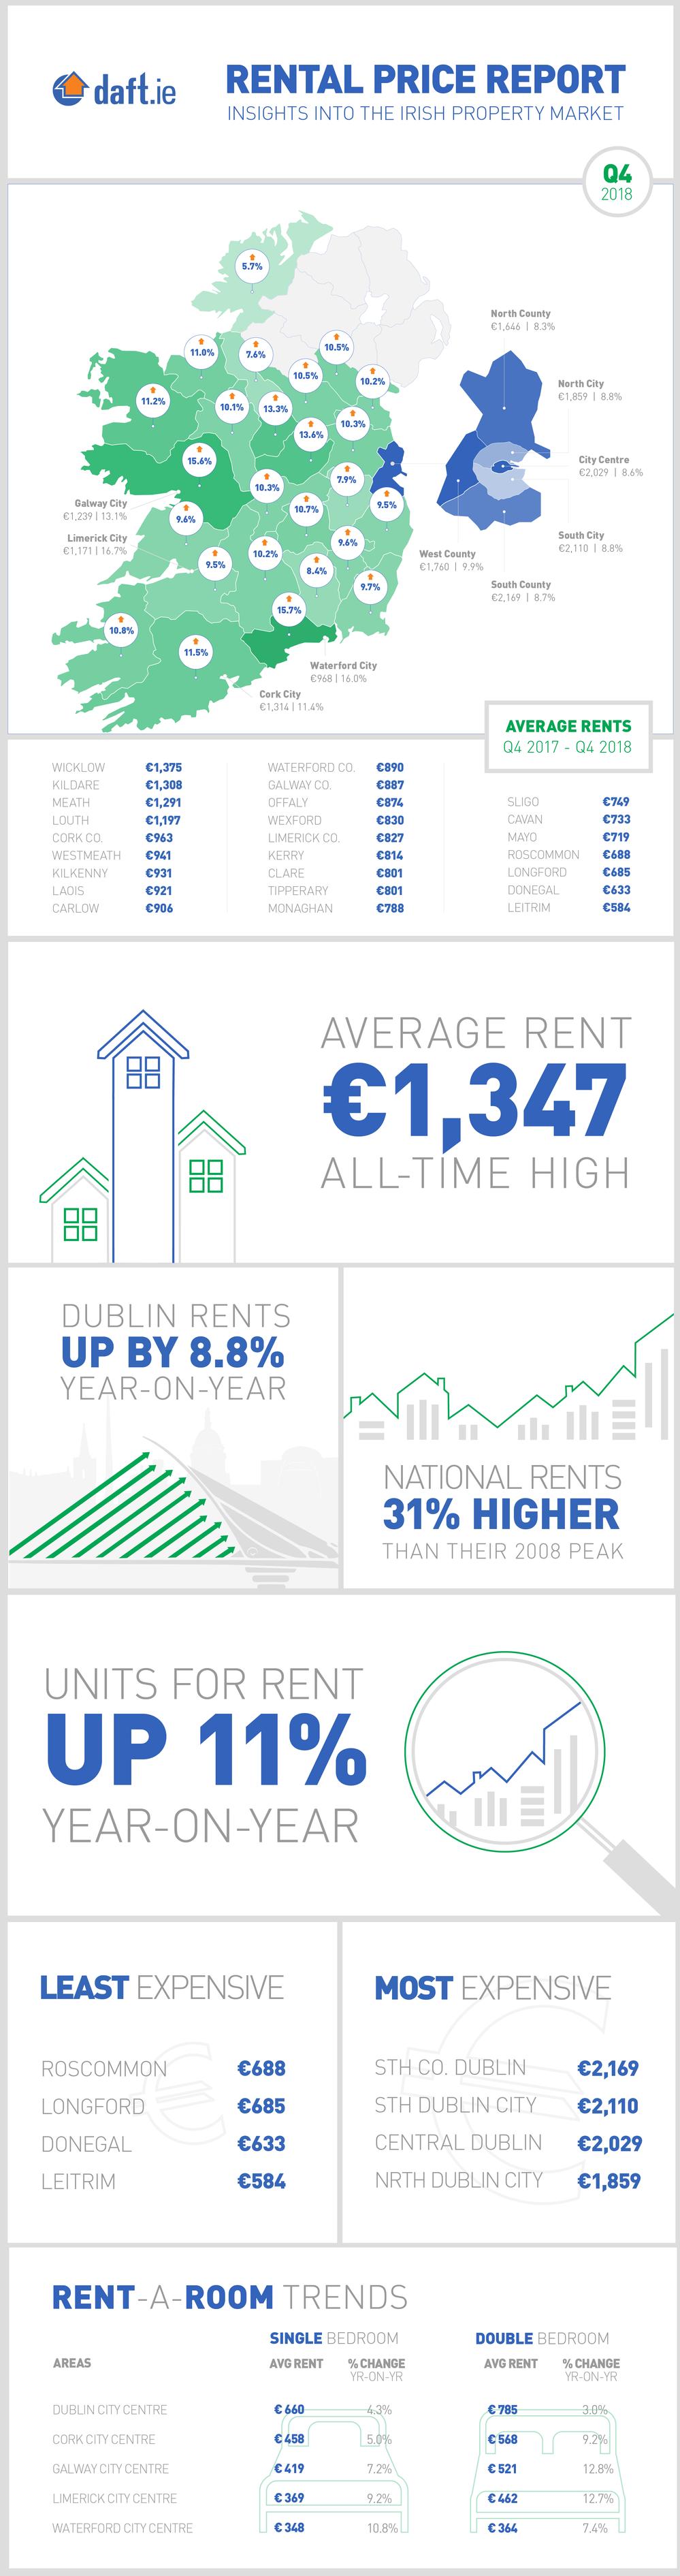 Ireland DAFT chart.png